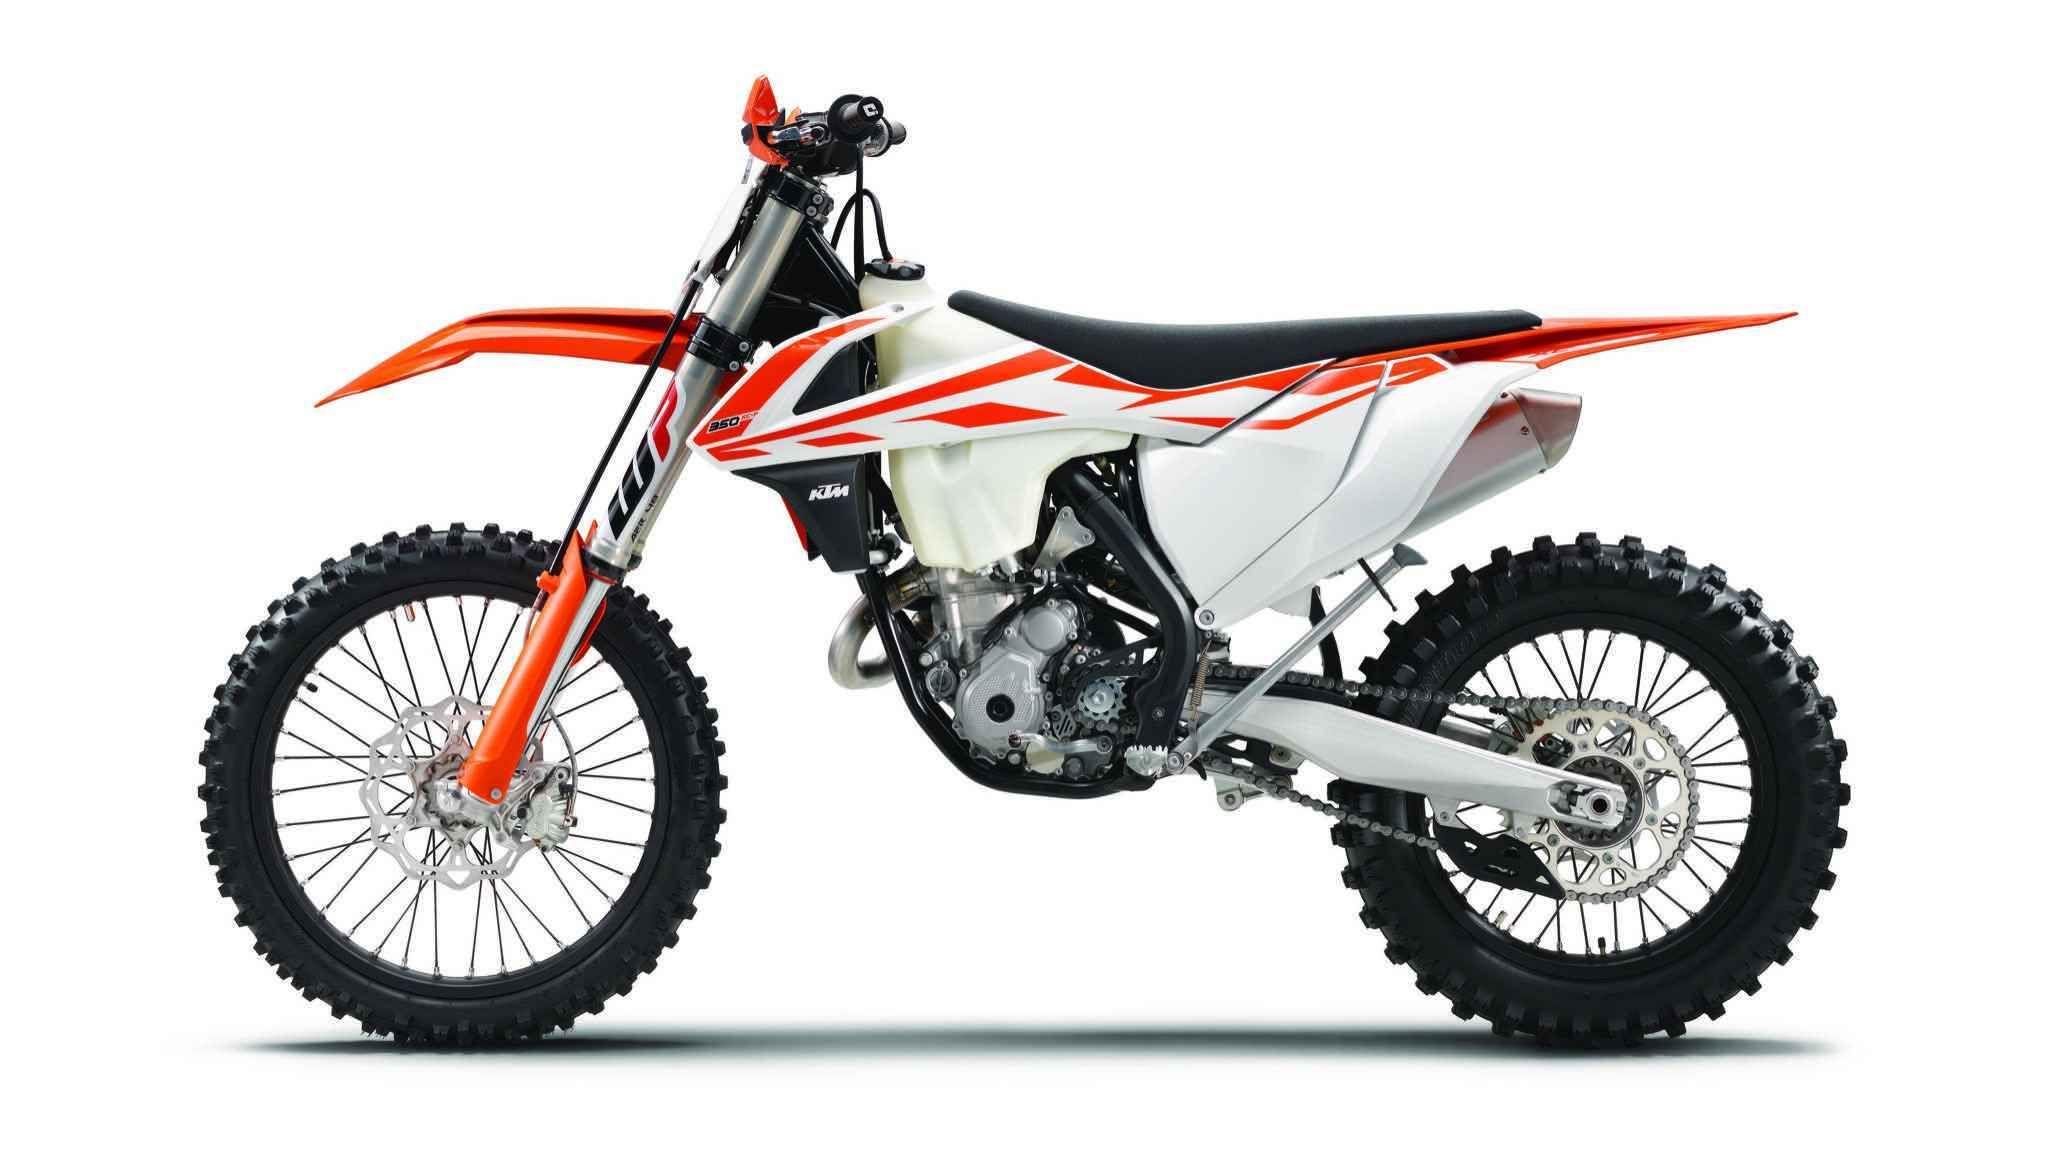 2017 Ktm 350 Sx F Ktm Motocross Ktm Dirt Bikes Ktm